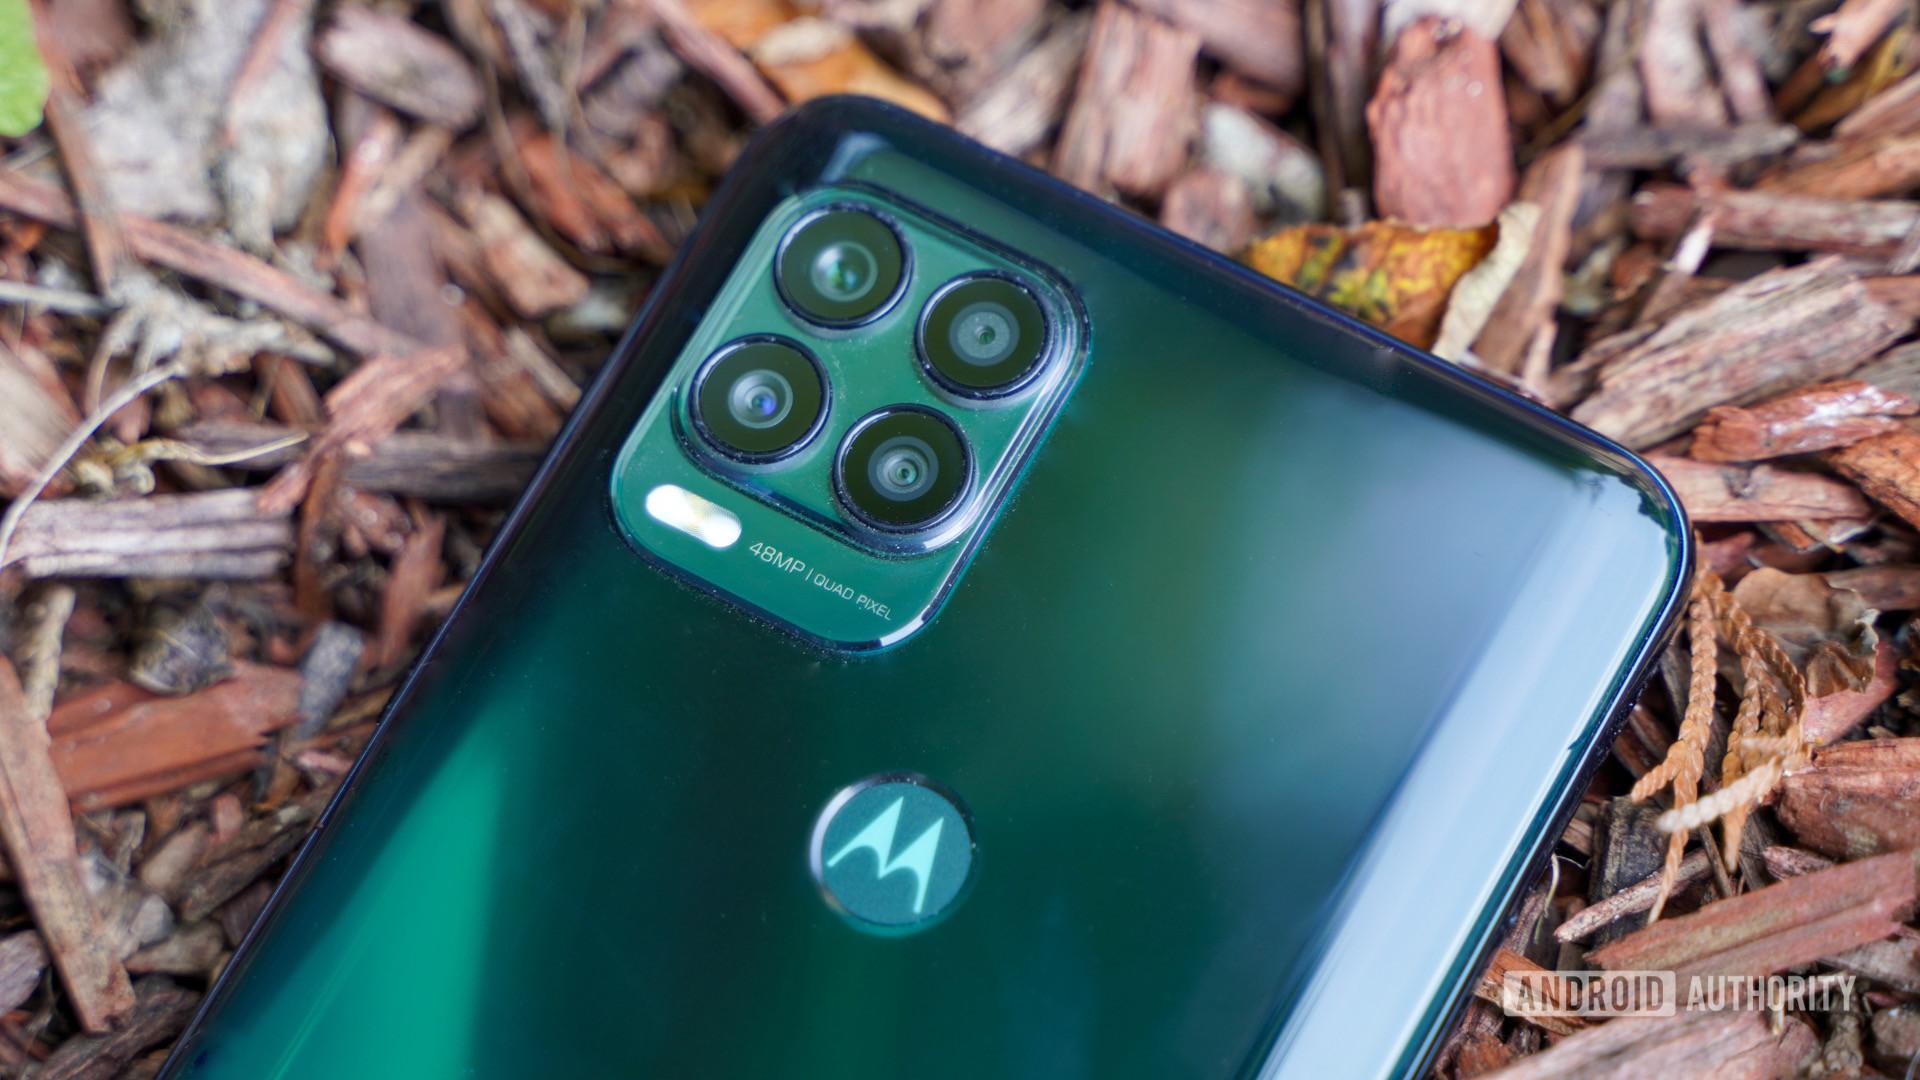 Motorola Moto G Stylus 5G camera tilted